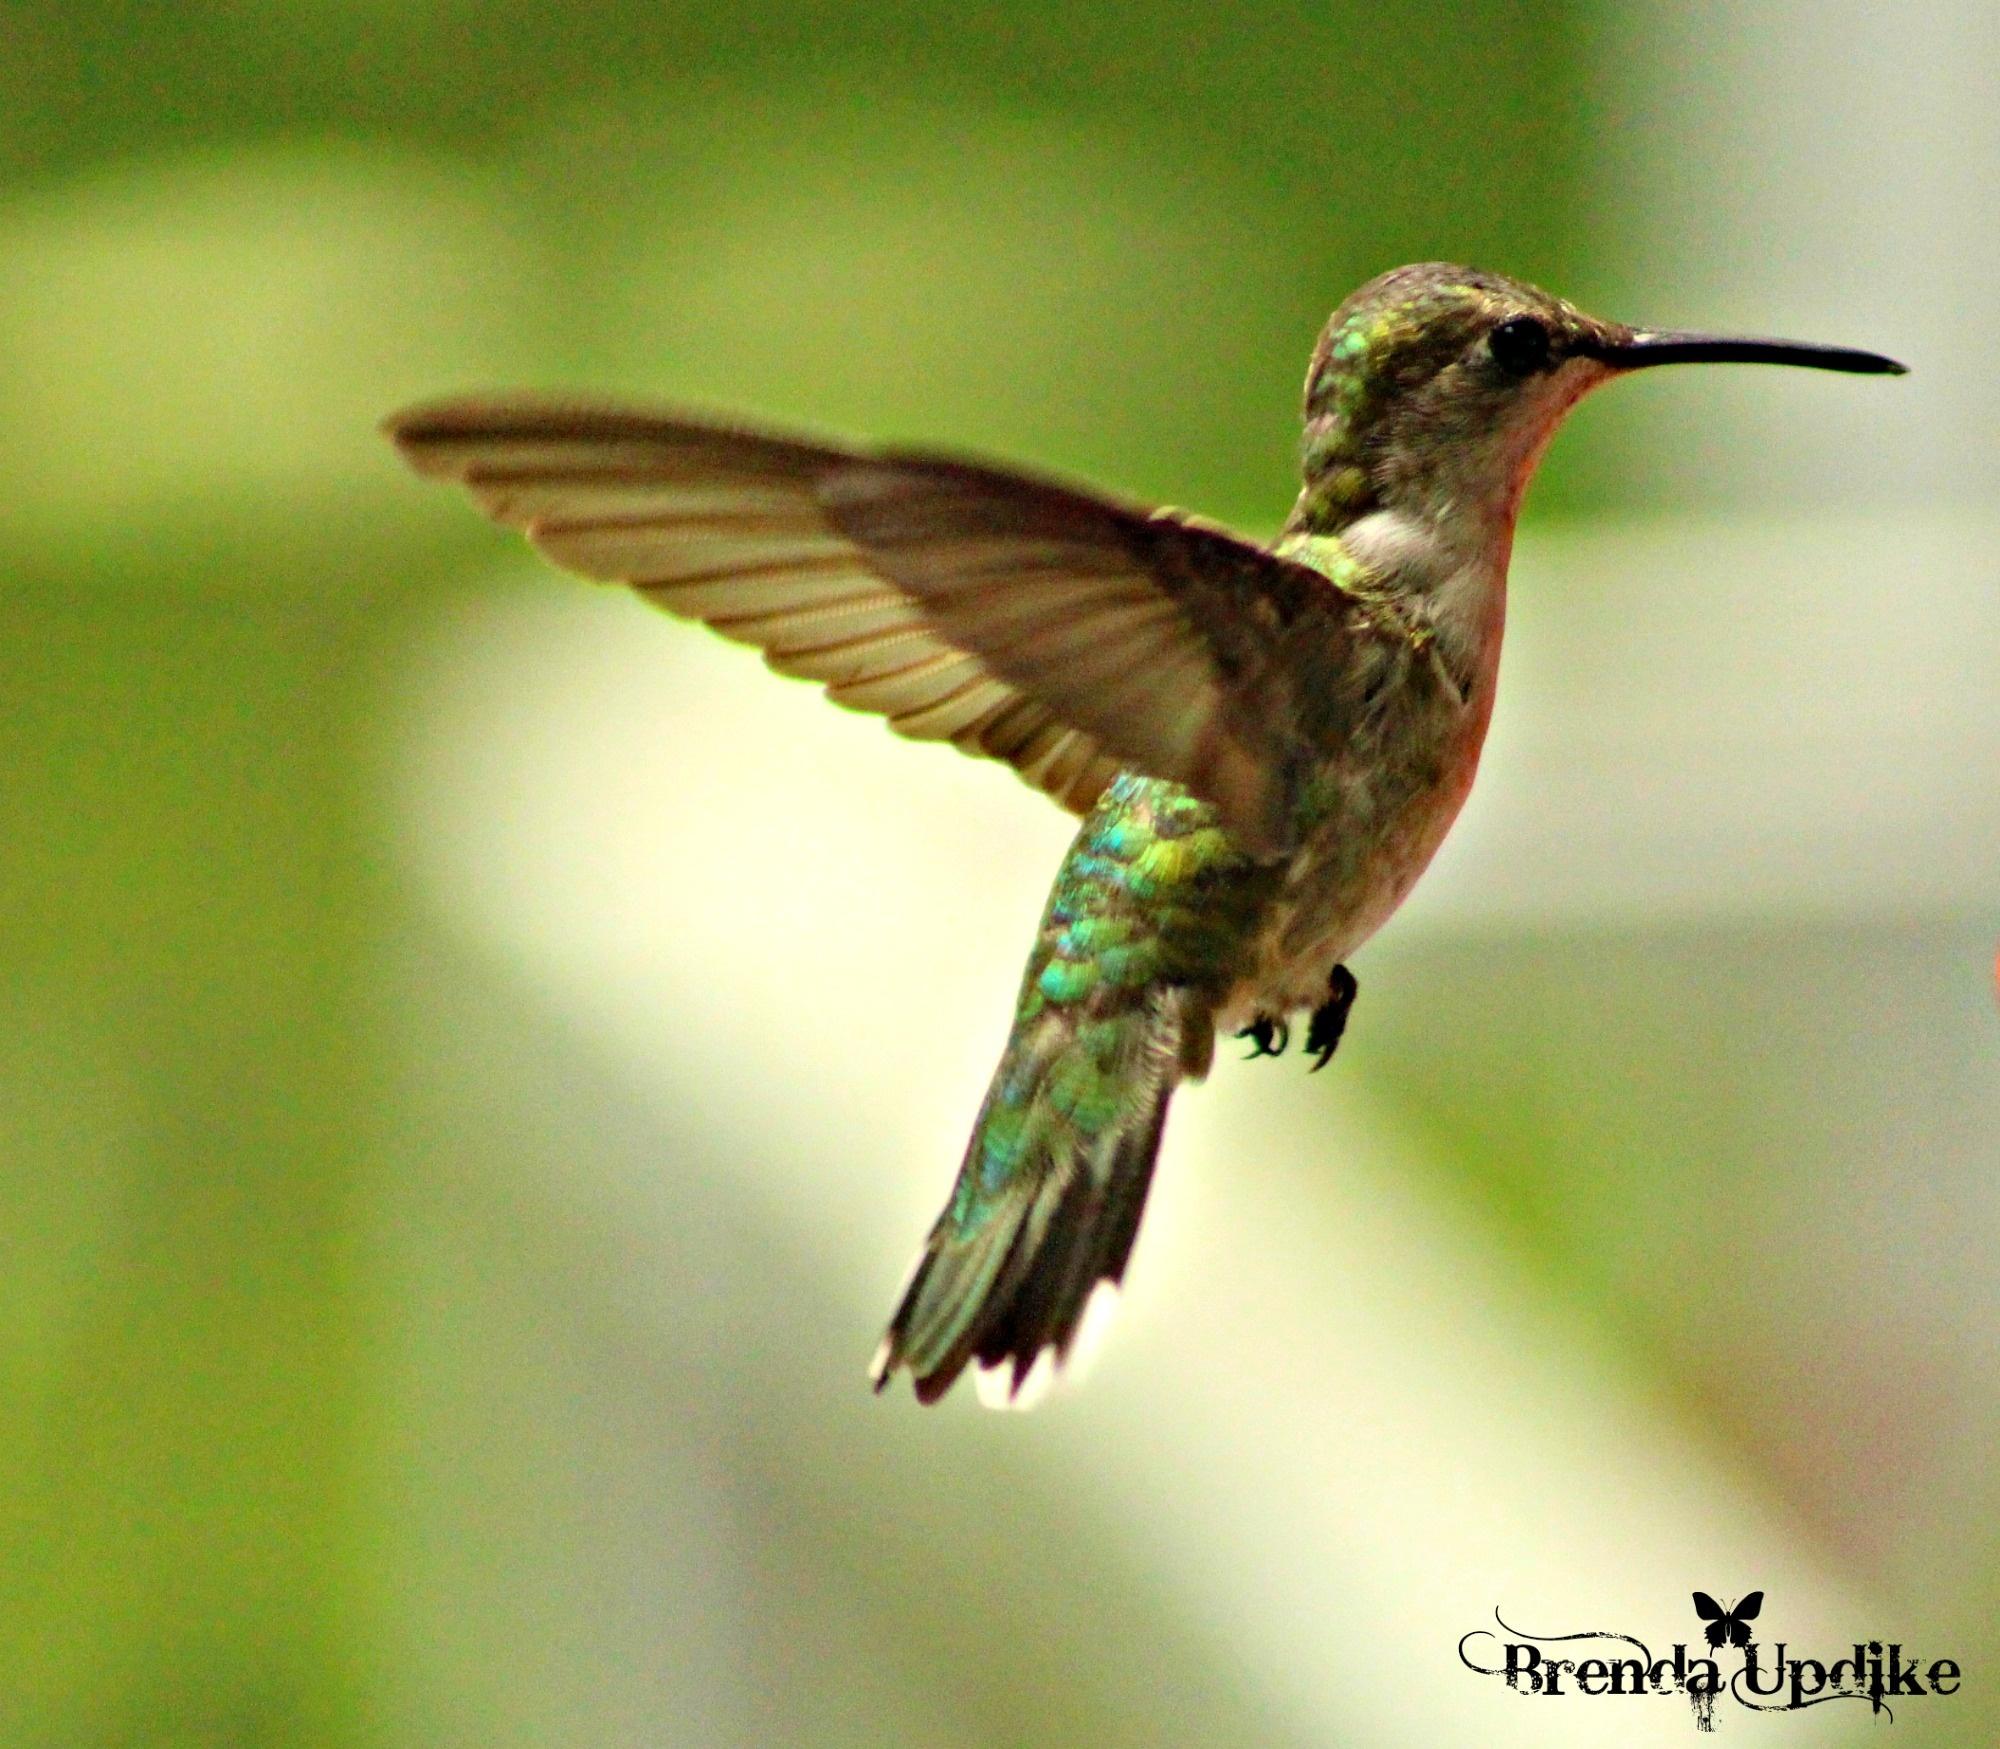 Hmmingbird by Brenda Updike